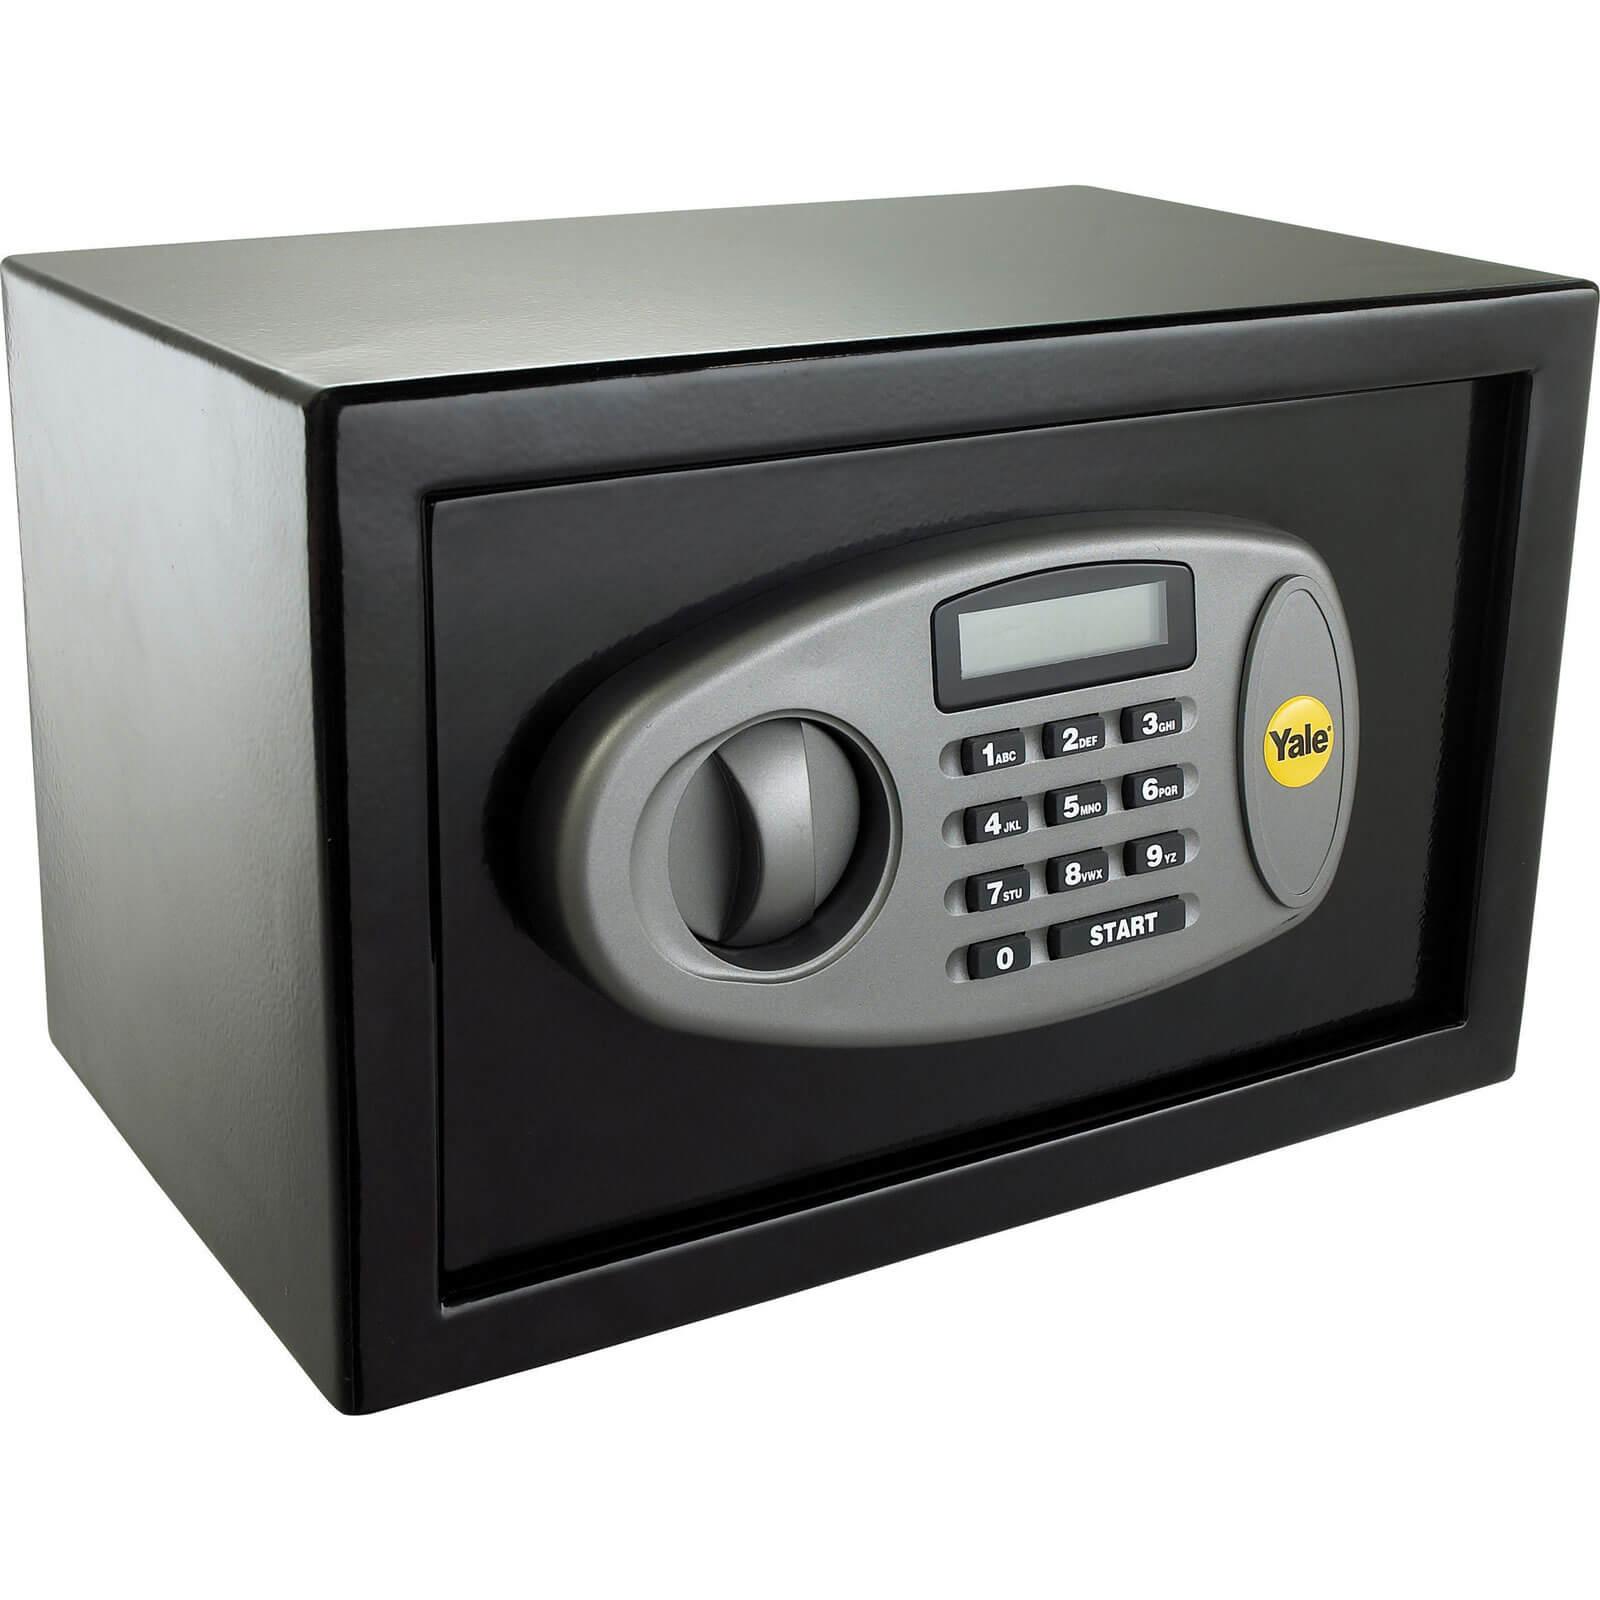 Yale Portable Travel Safe